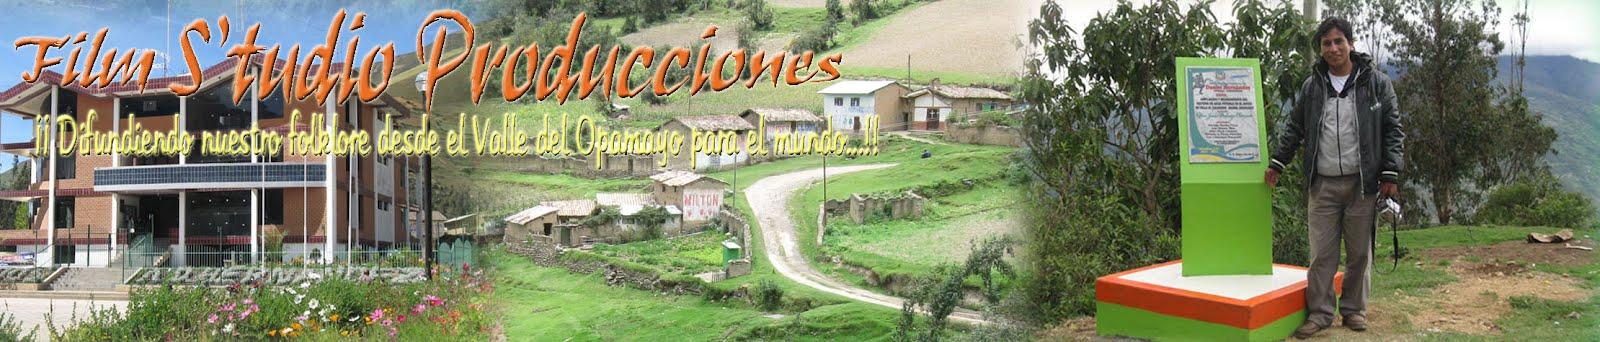 :::Film S'tudio Producciones:::